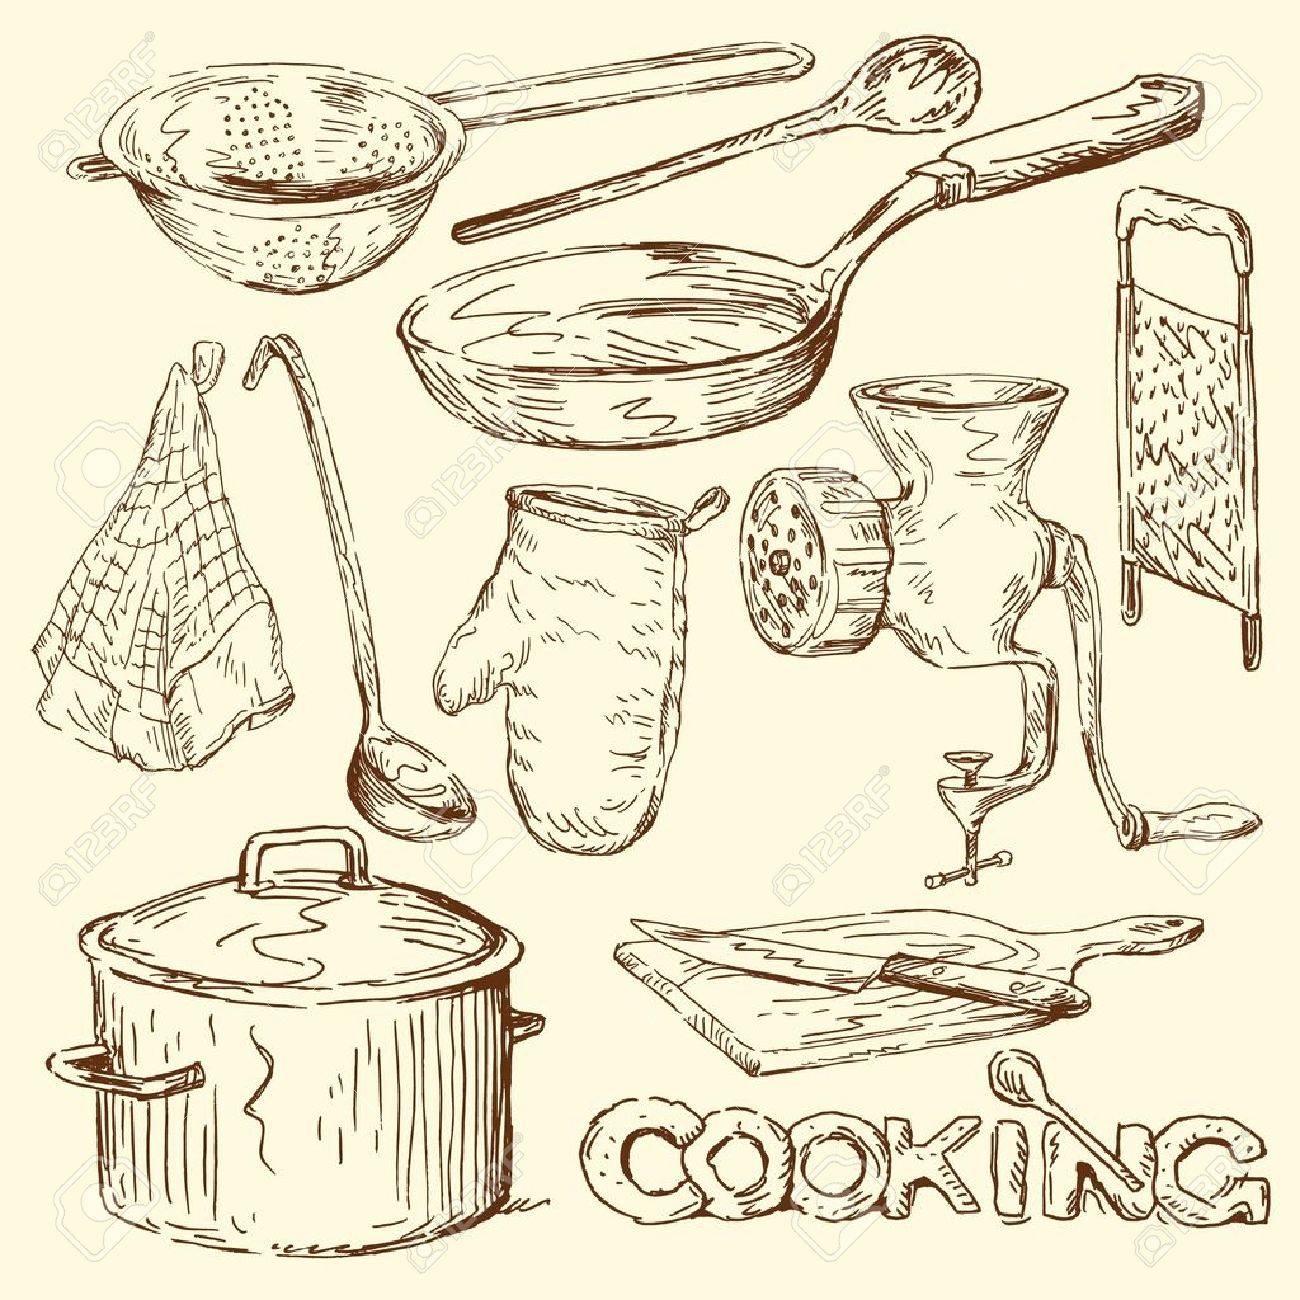 cooking doodles - 14191334